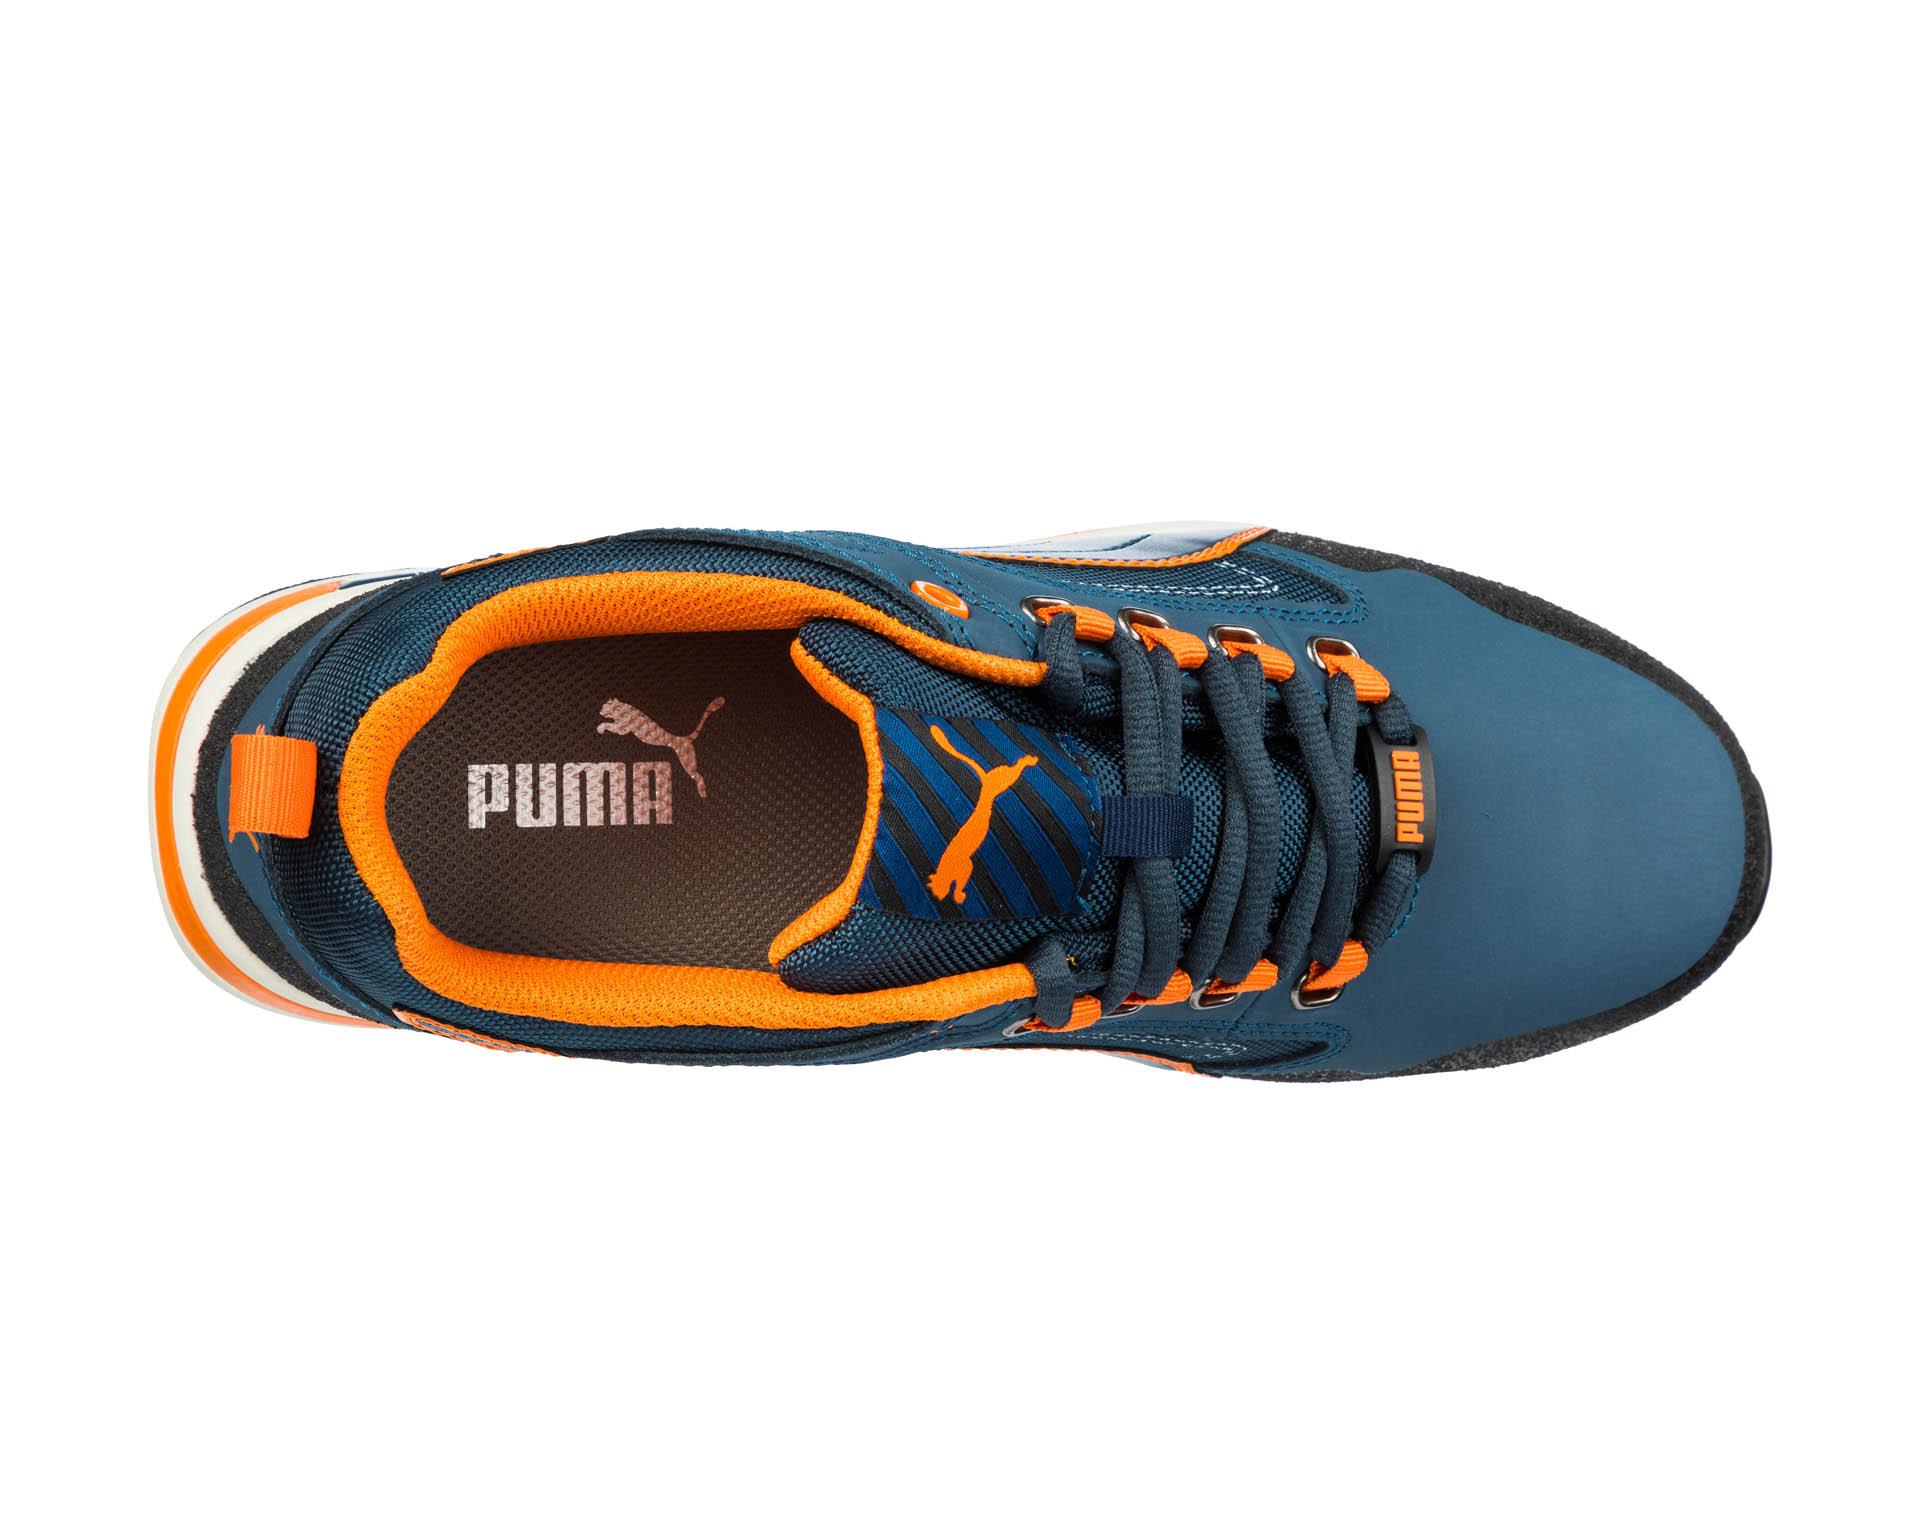 Puma Crossfit Low (643100) ab 63,04 € | Preisvergleich bei